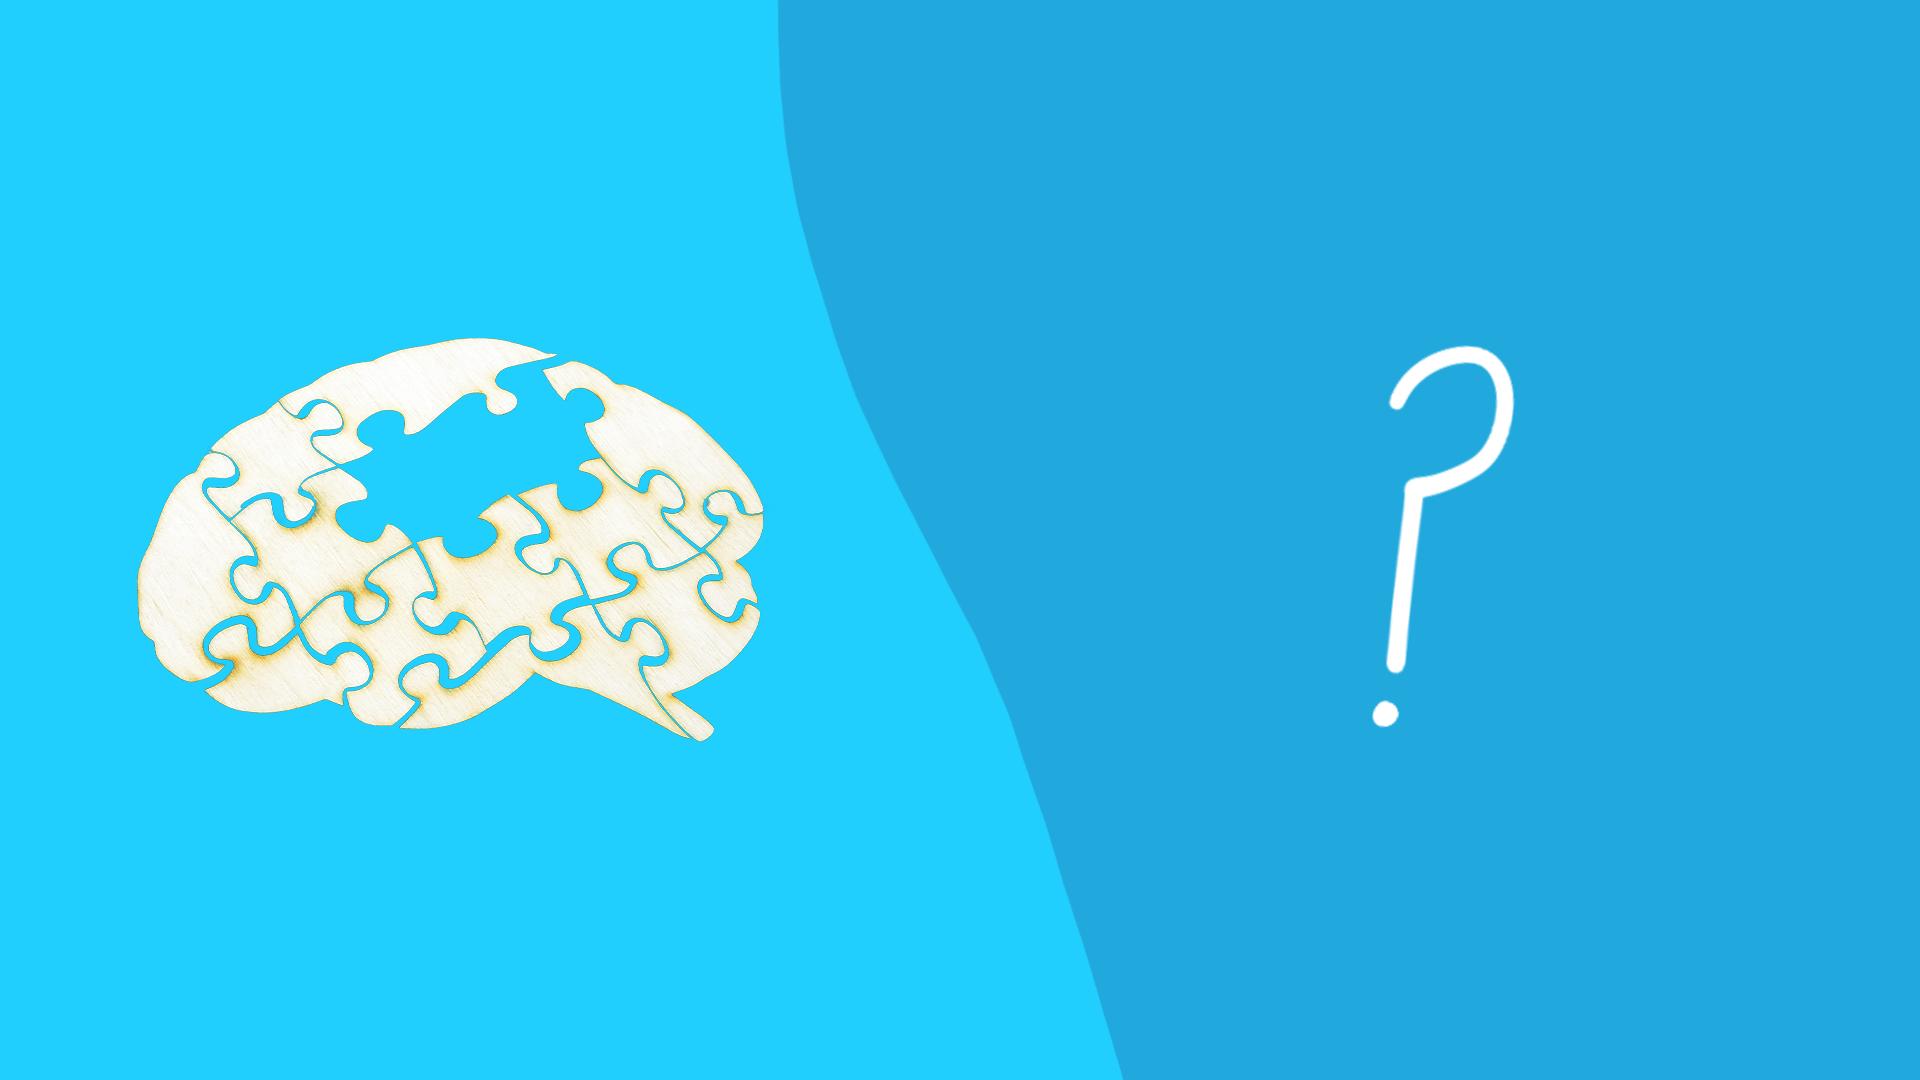 Delirium vs. dementia: Compare causes, symptoms, treatments & more